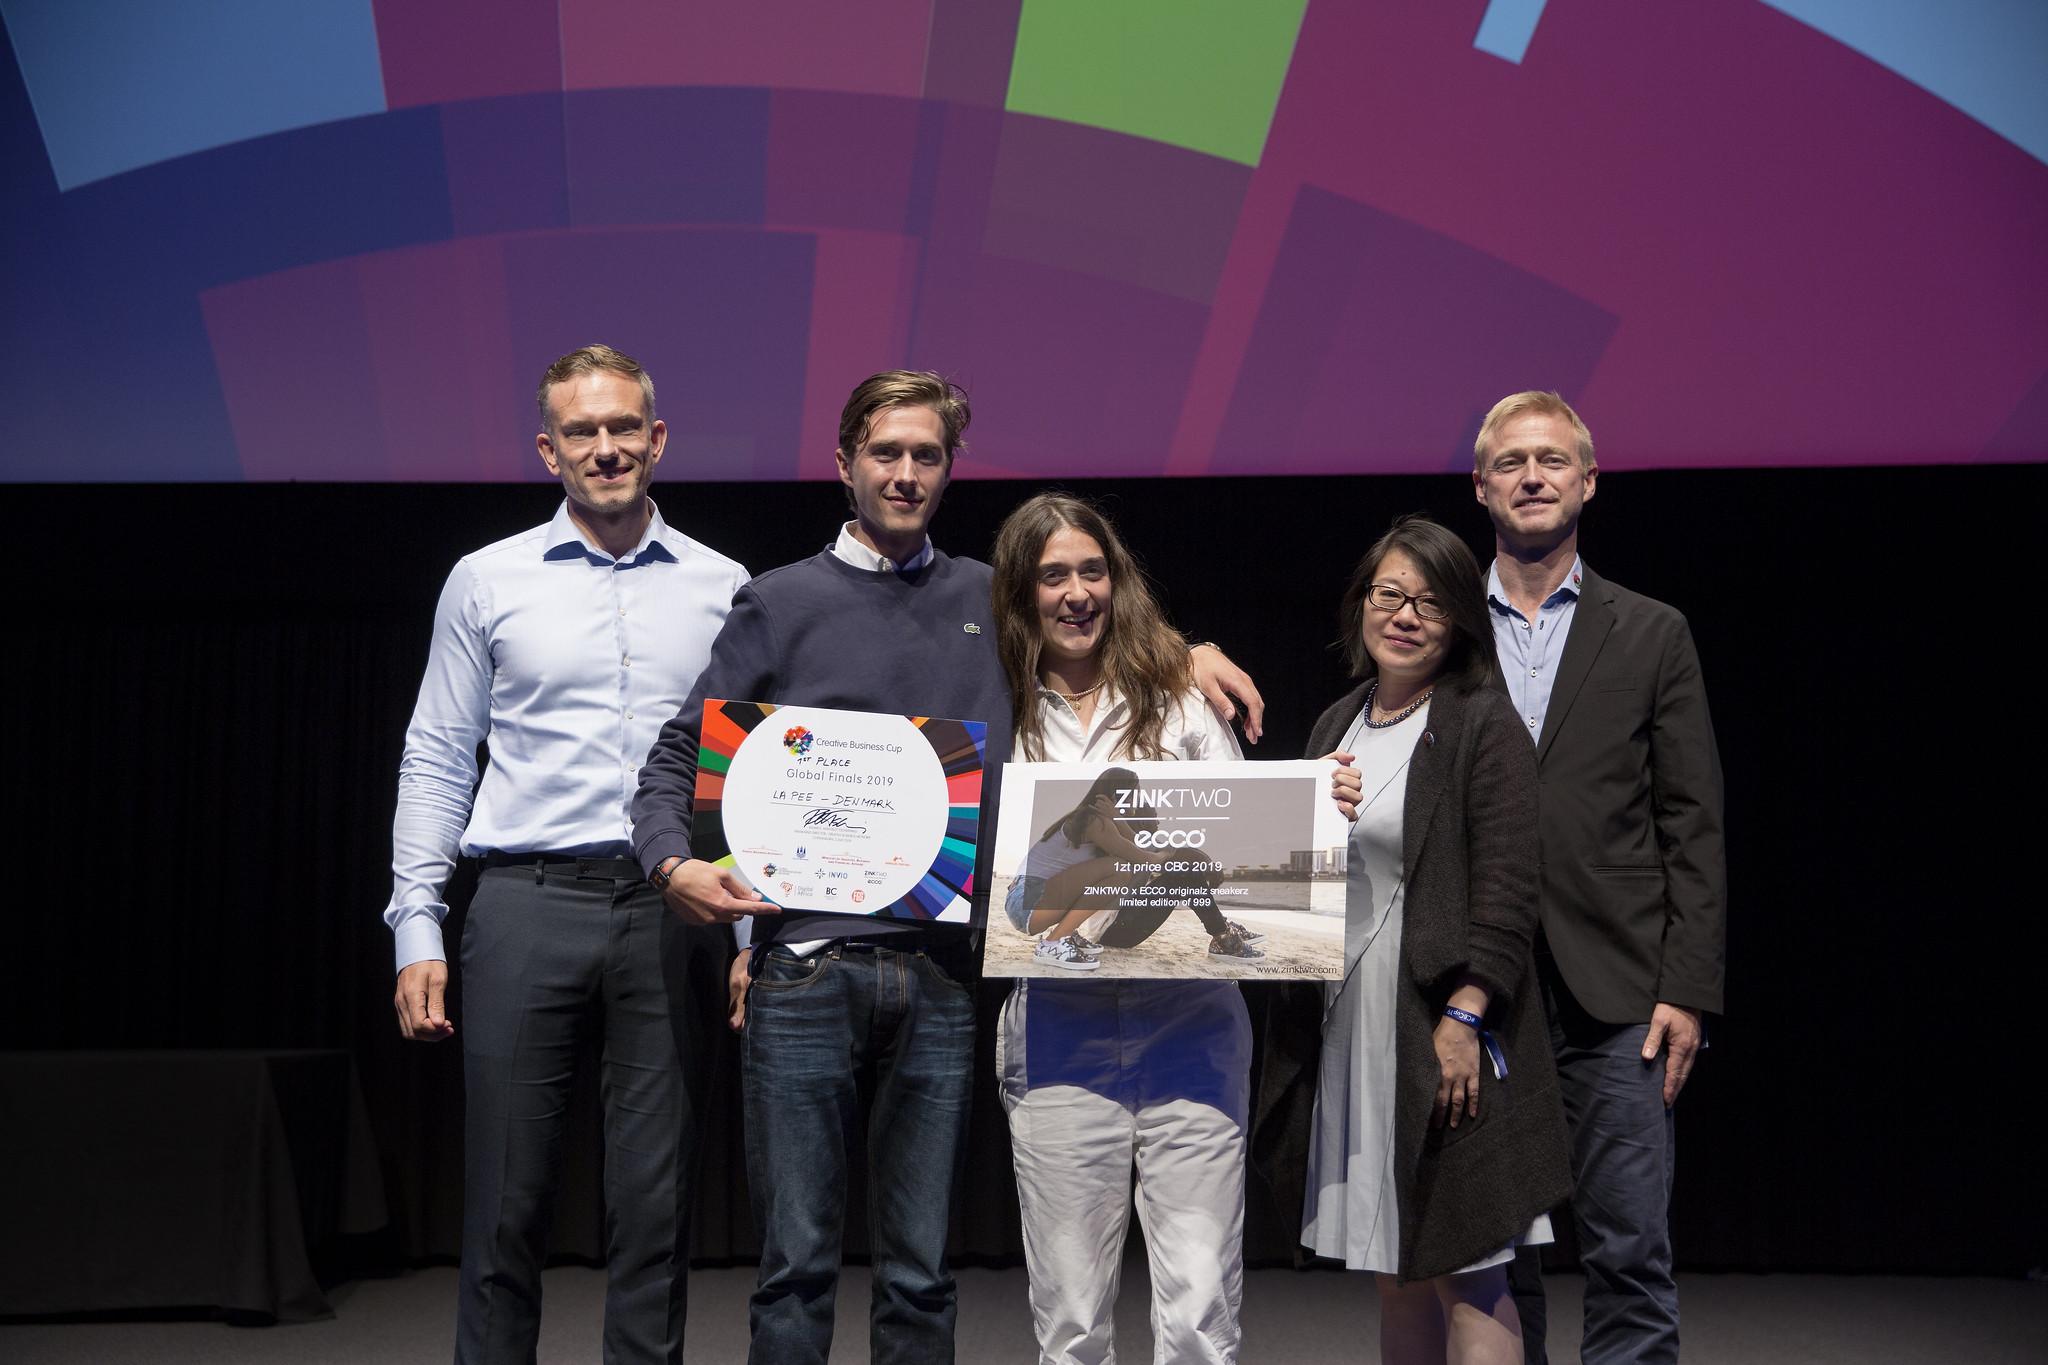 Creative Business Cup 2019. Фото: Кристиан Риддер-Нильсен/Creative Business Cup